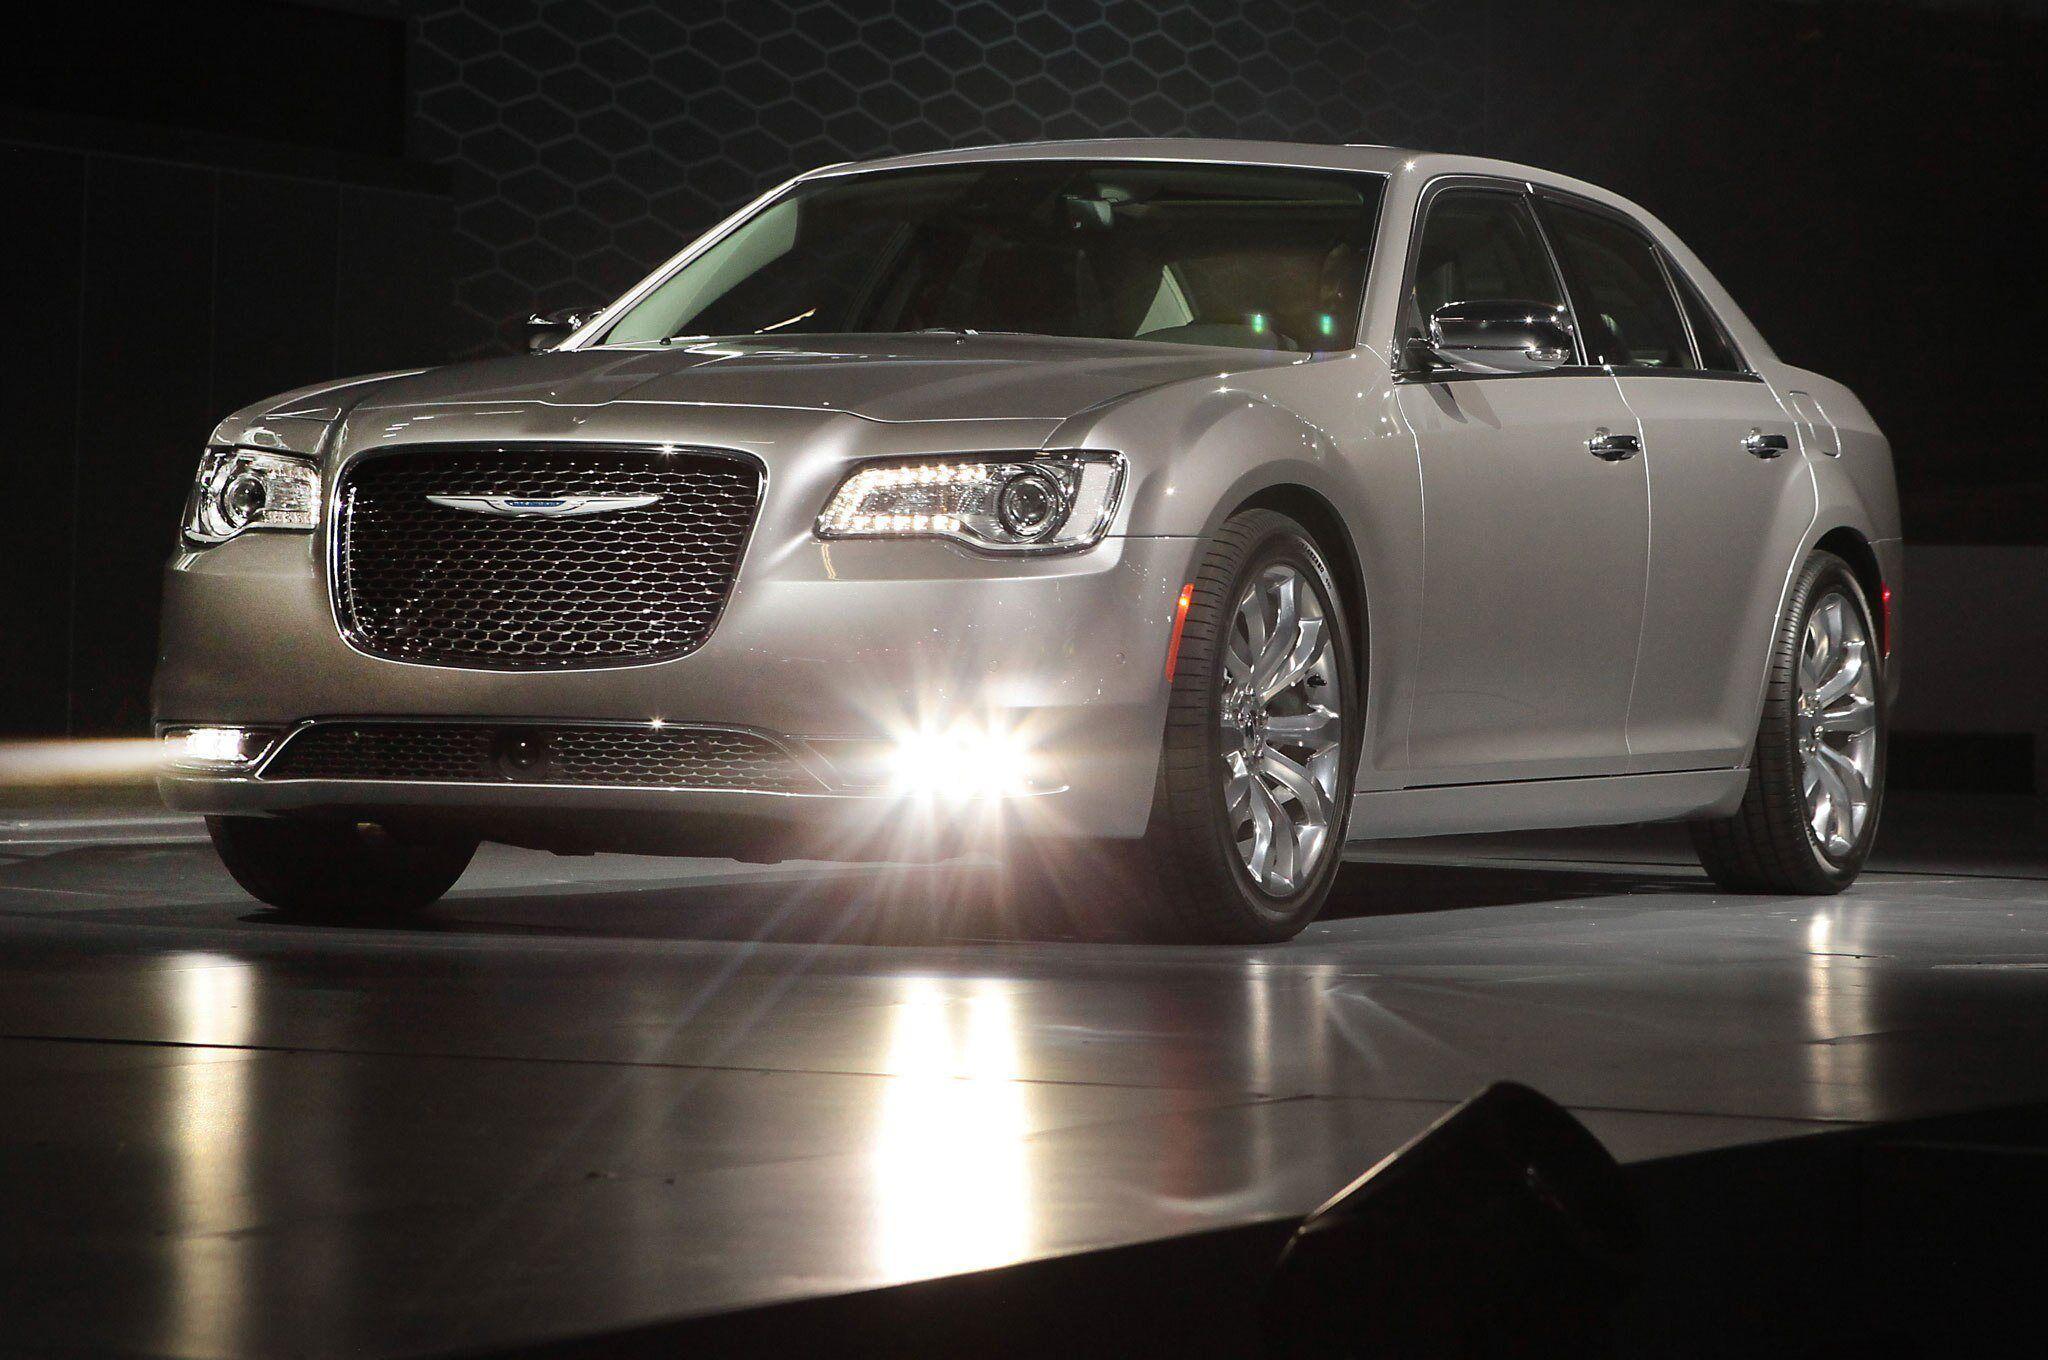 2021 Chrysler 300 Srt8 Pictures